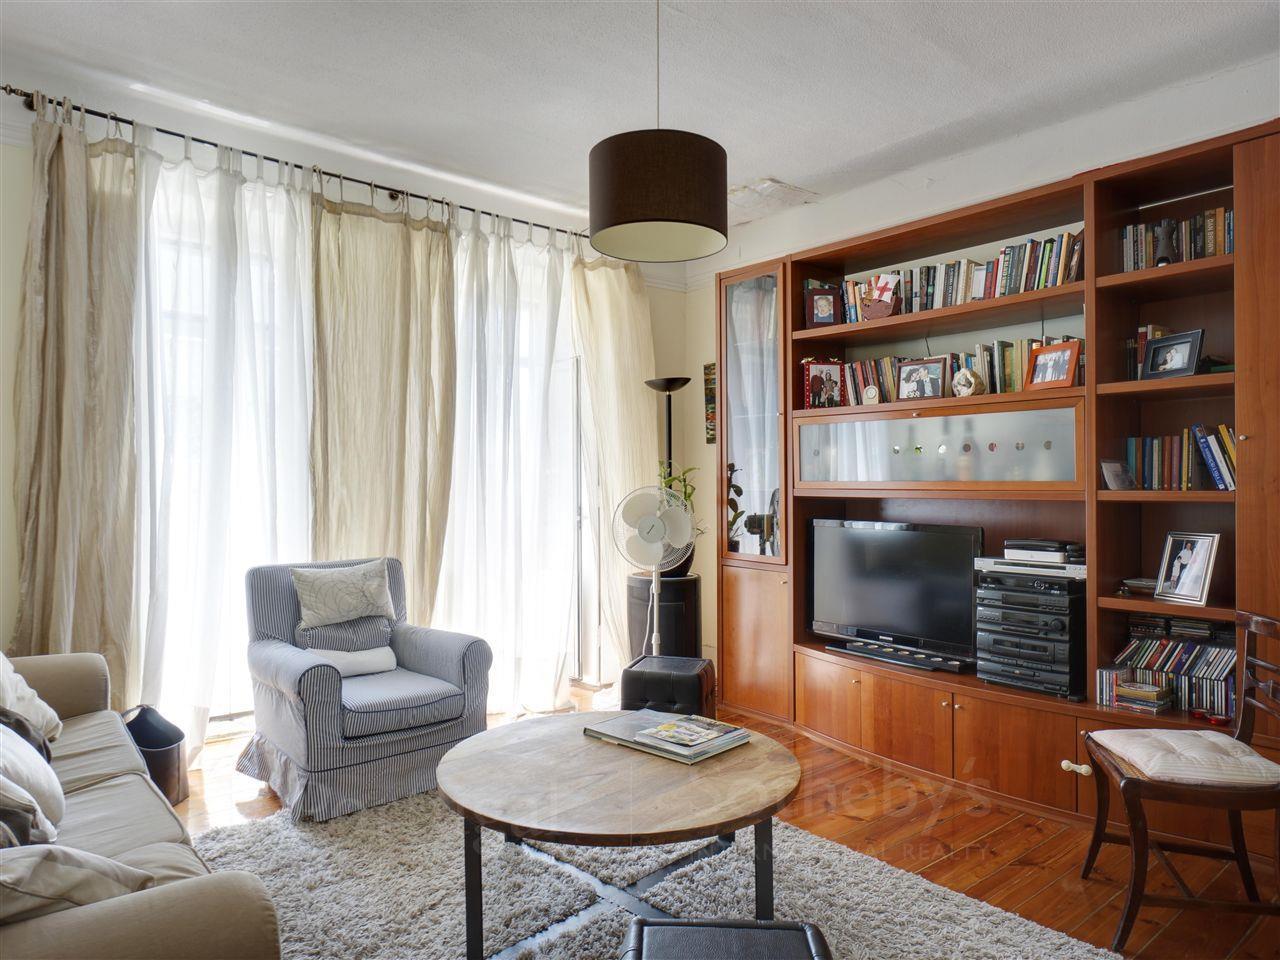 Apartment for Sale at Flat, 4 bedrooms, for Sale Avenidas Novas, Lisboa, Lisboa Portugal